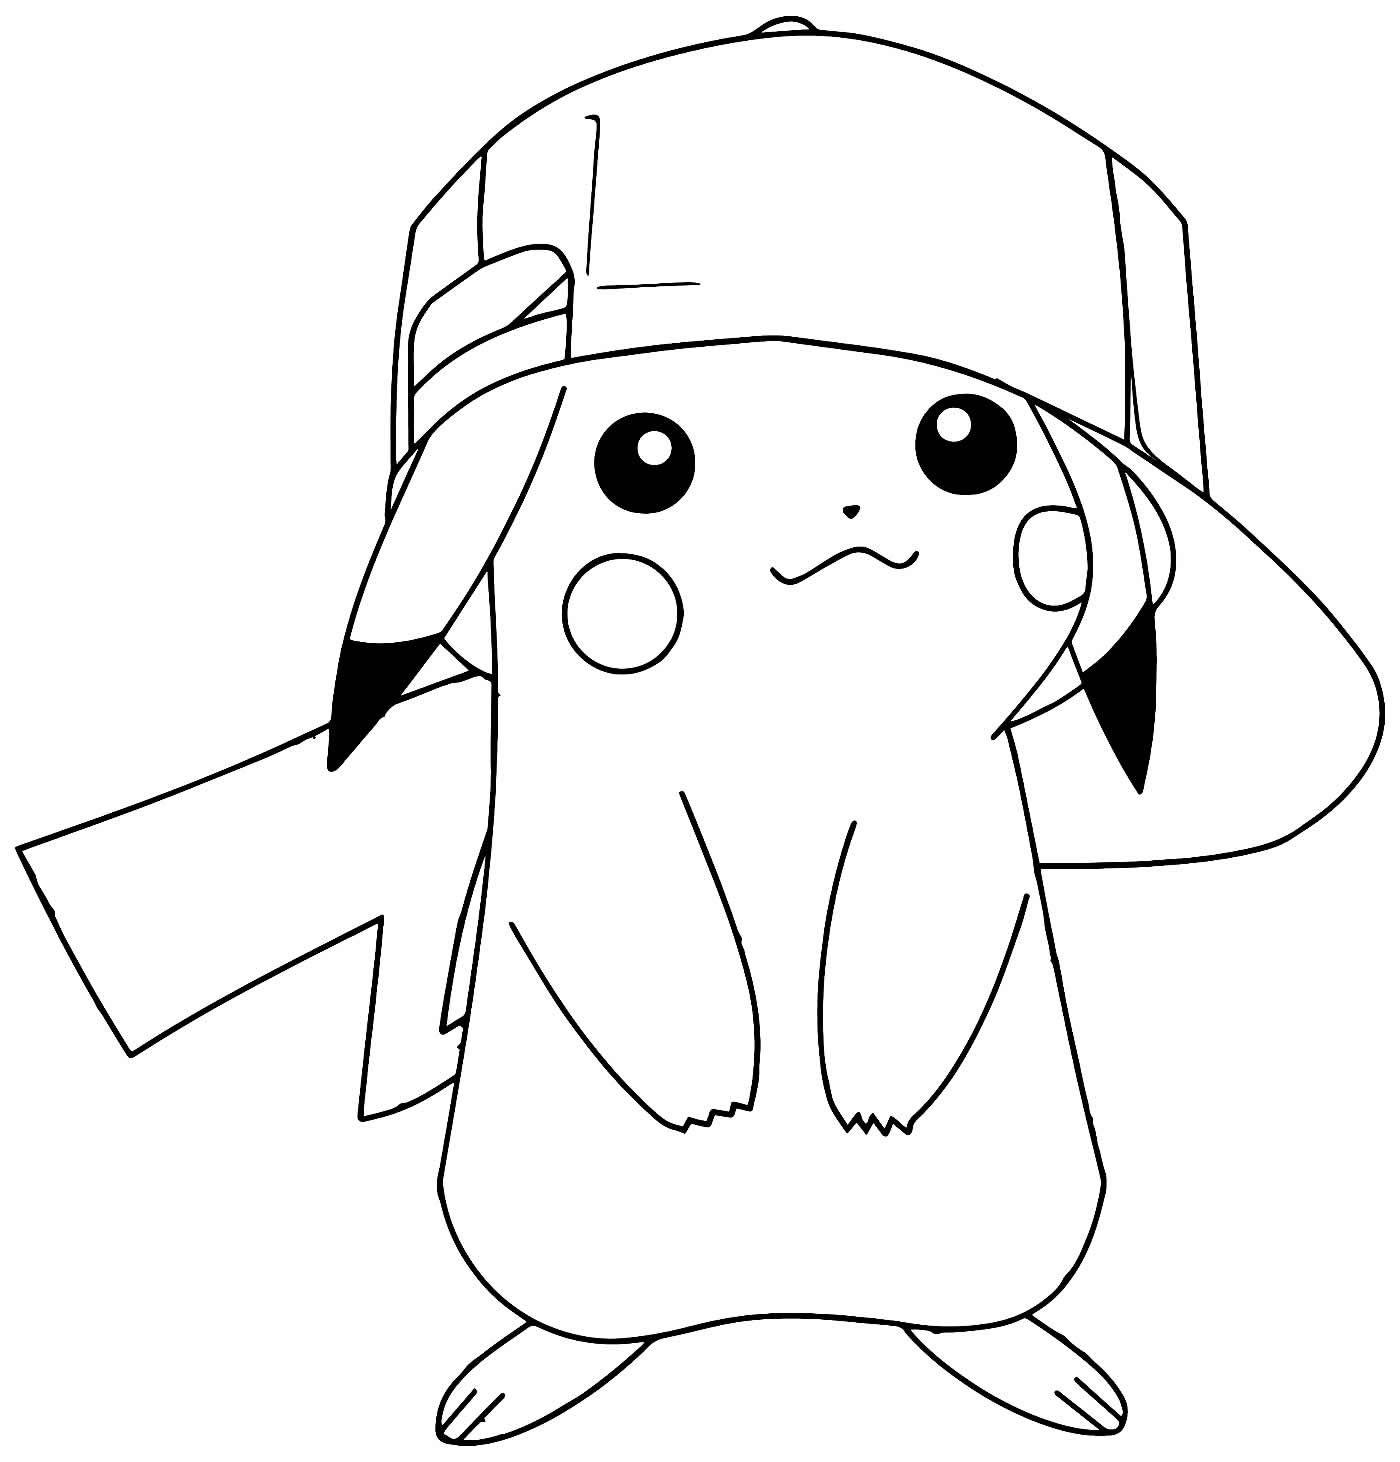 Coloriage Pokemon Pikachu Coloring Page Cartoon Coloring Pages Pokemon Coloring Sheets